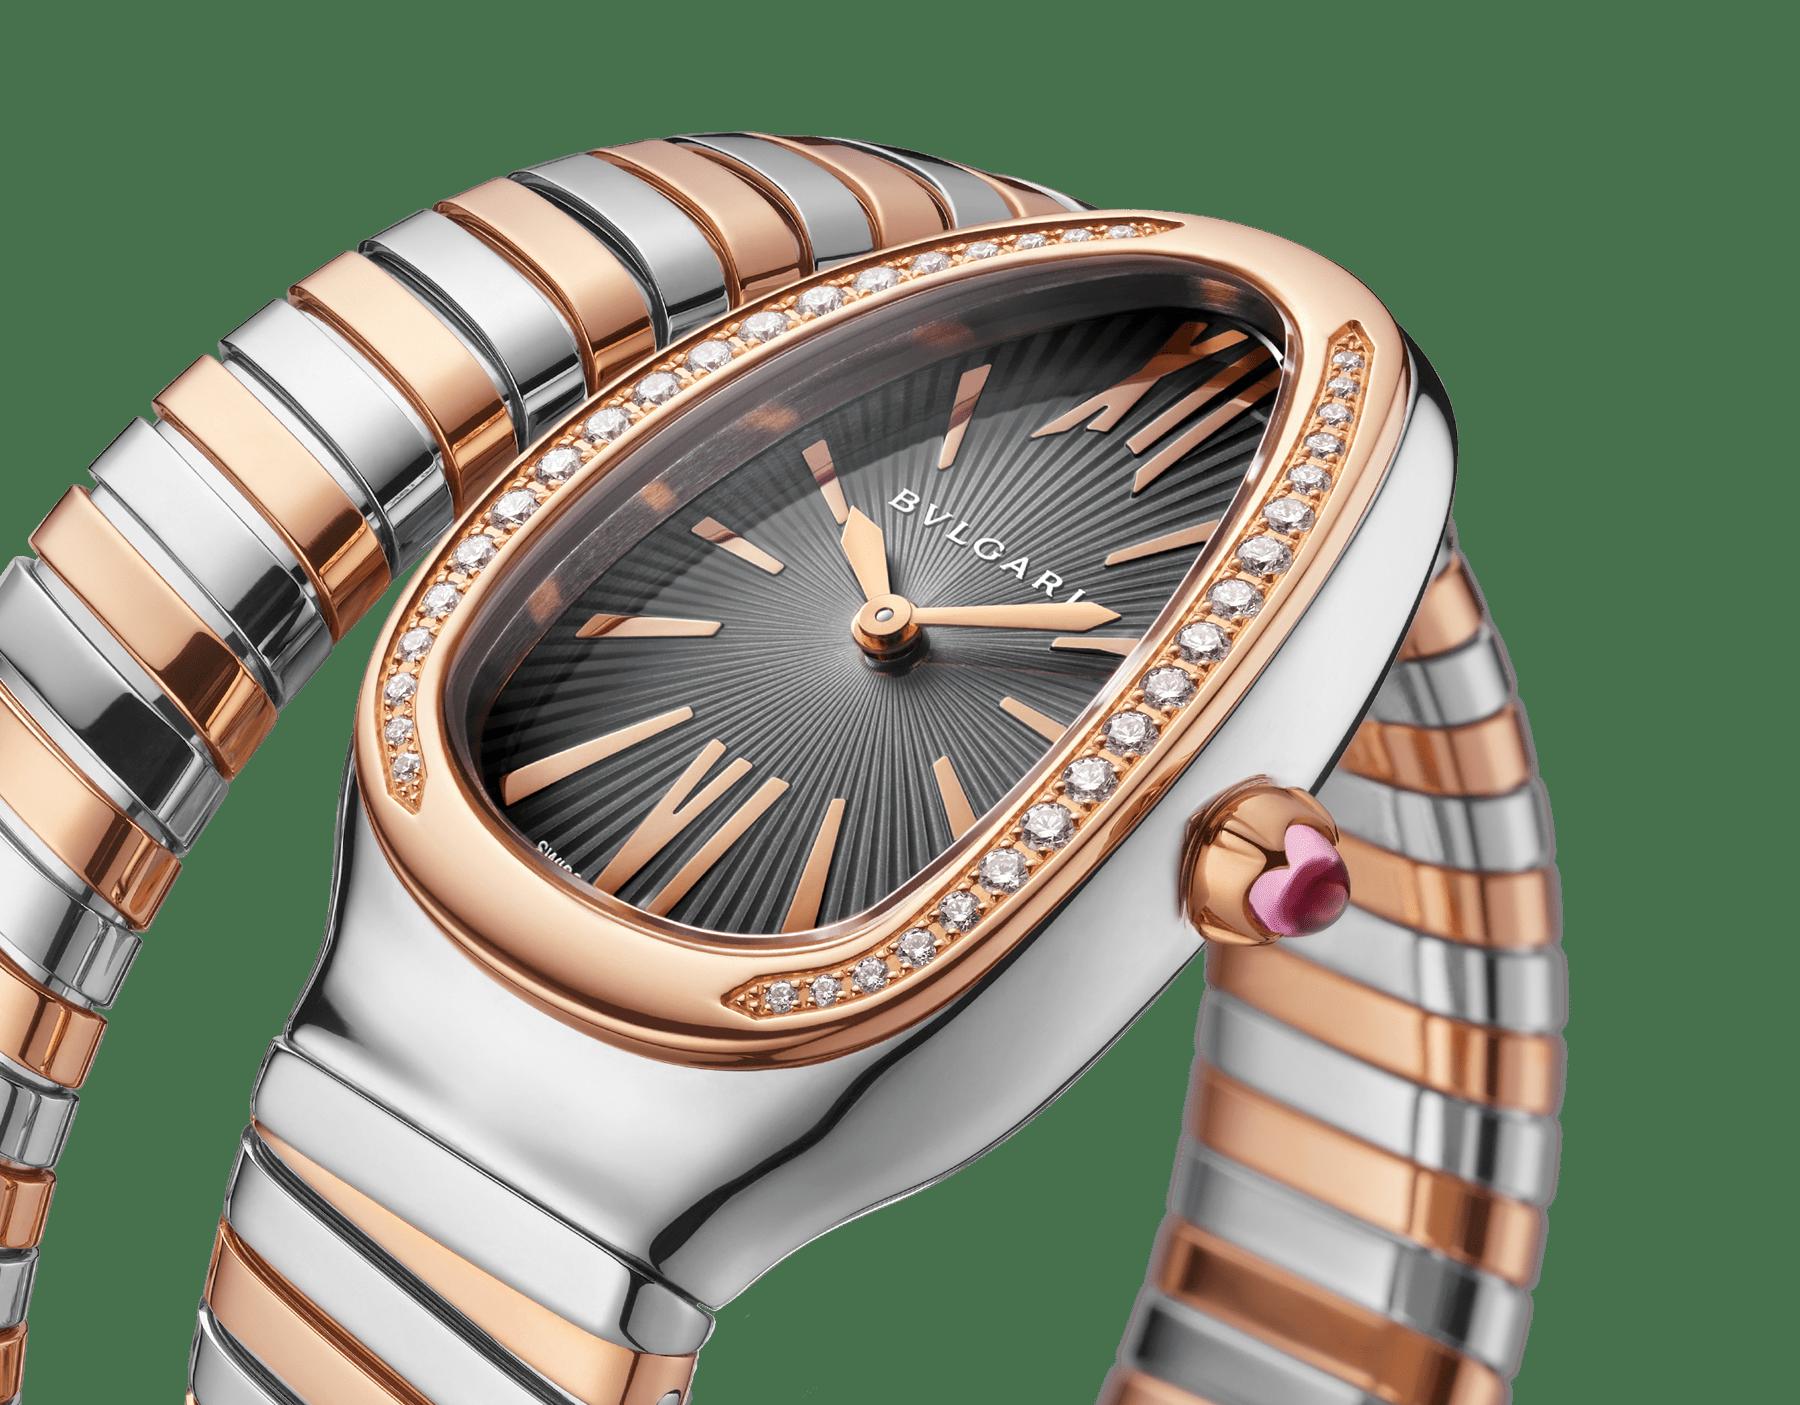 Serpenti Tubogas 單圈螺旋腕錶,精鋼錶殼,18K 玫瑰金錶圈鑲飾明亮型切割鑽石,灰色漆面錶盤,18K 玫瑰金和精鋼錶帶。 102681 image 3